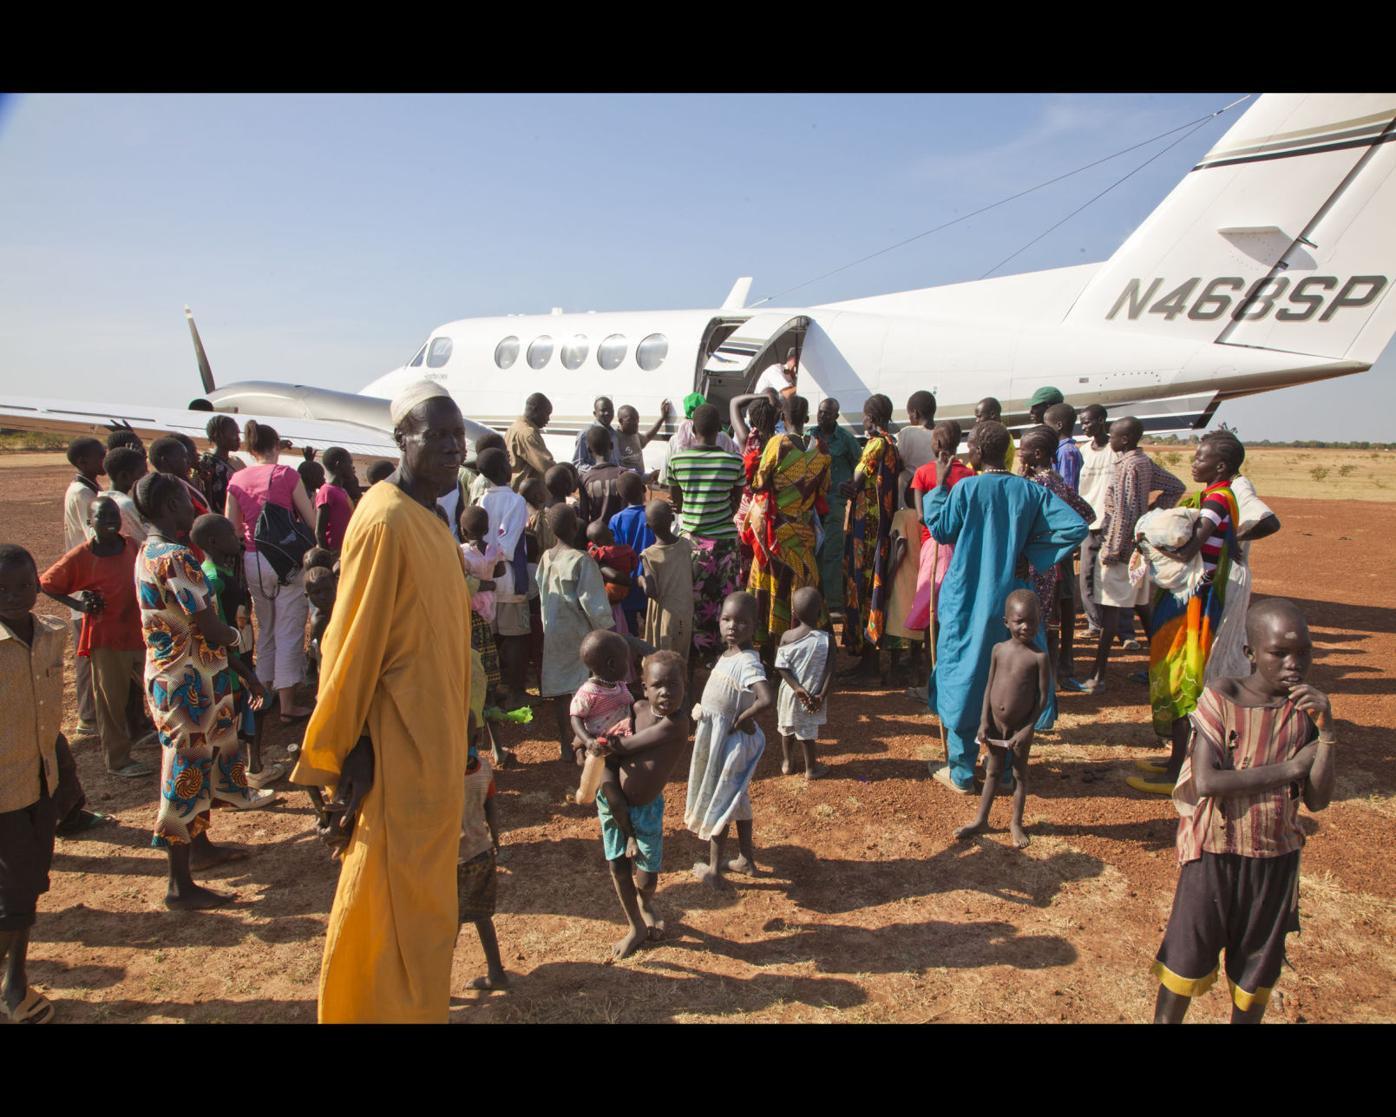 Samaritan's Purse cleft lip surgeries in South Sudan